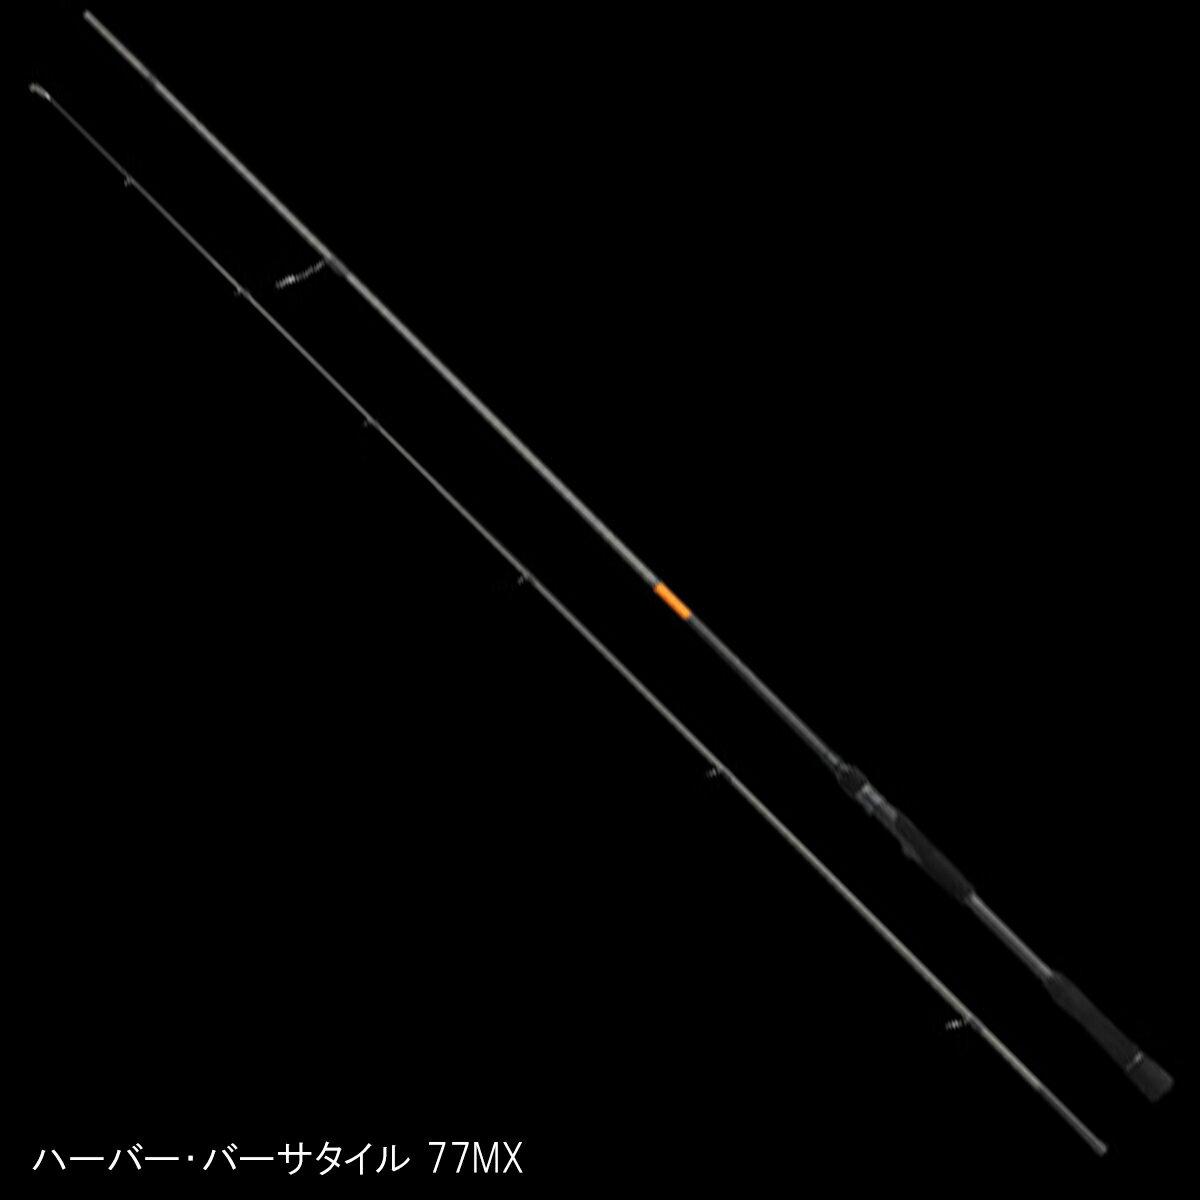 Brute'HR ハーバー・バーサタイル 77MX(東日本店)